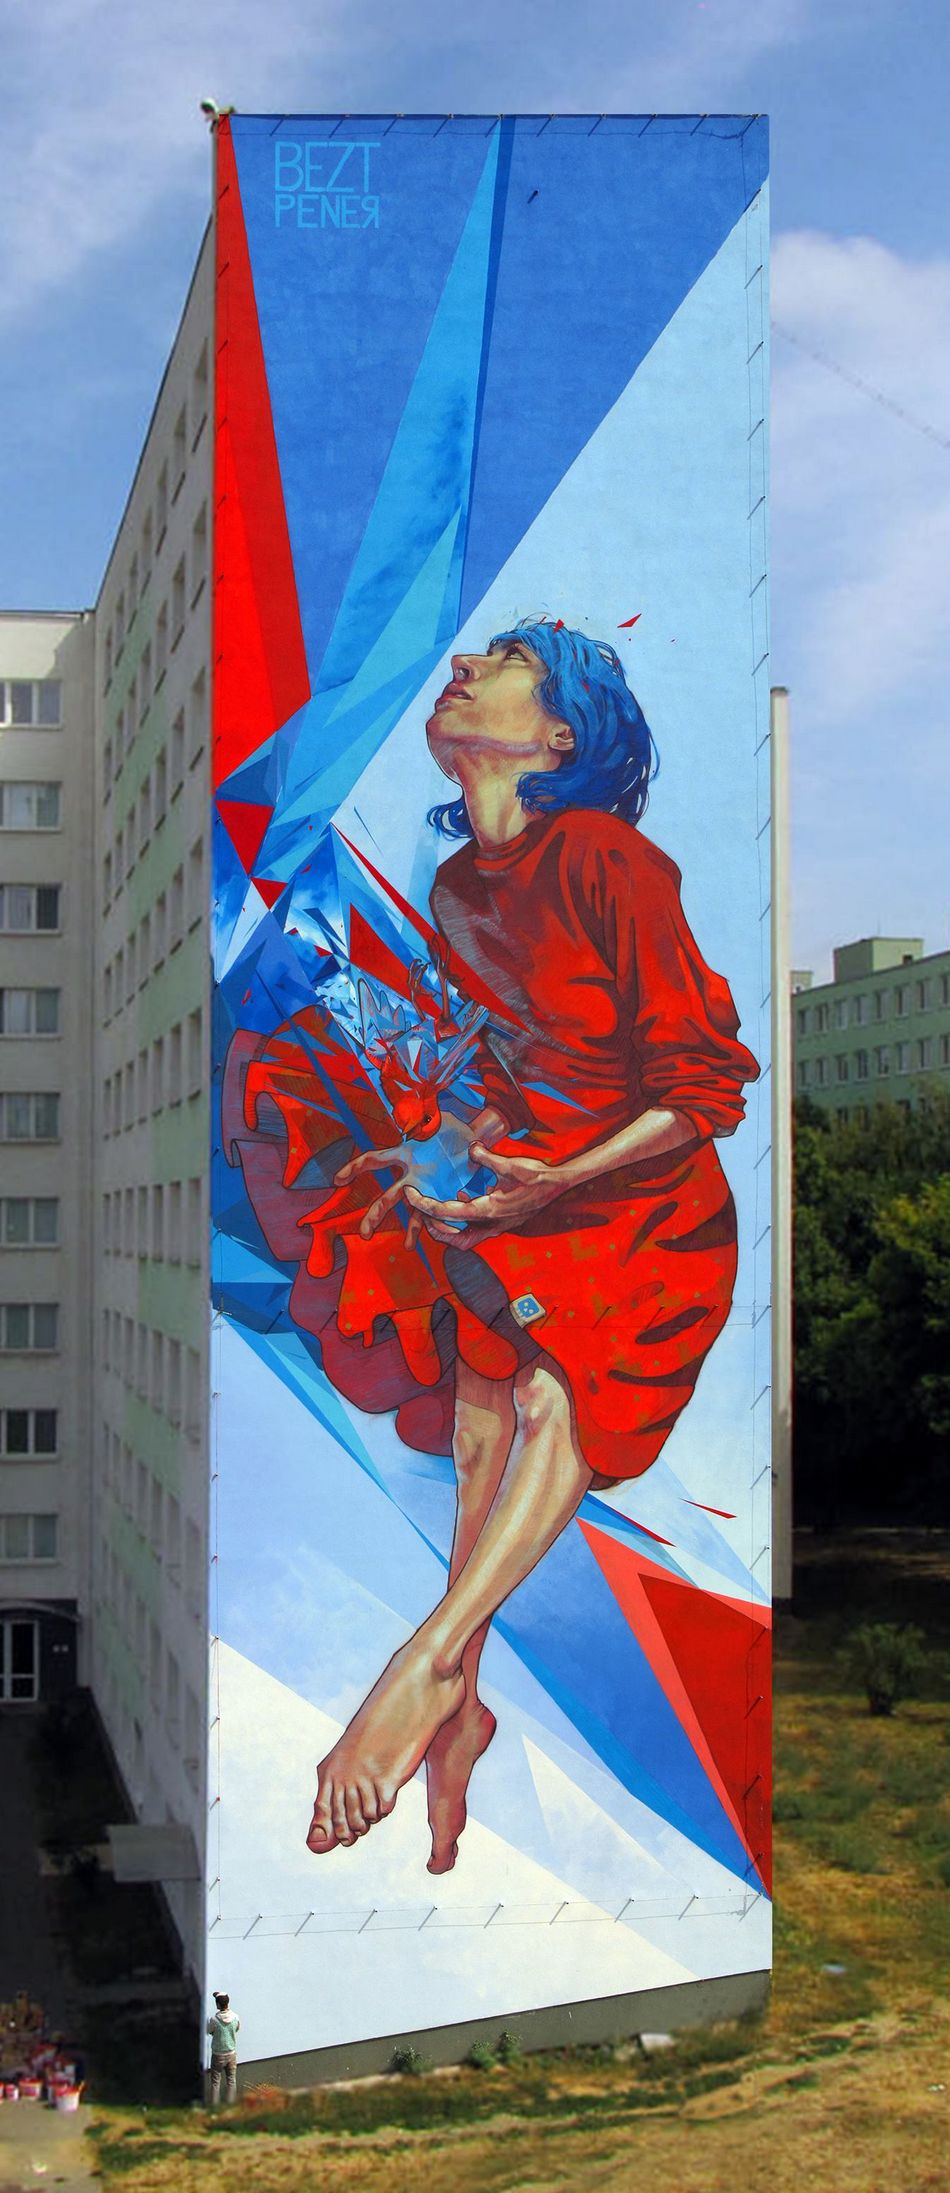 etam-cru-bezt-sainer-street-art-large-murals-11